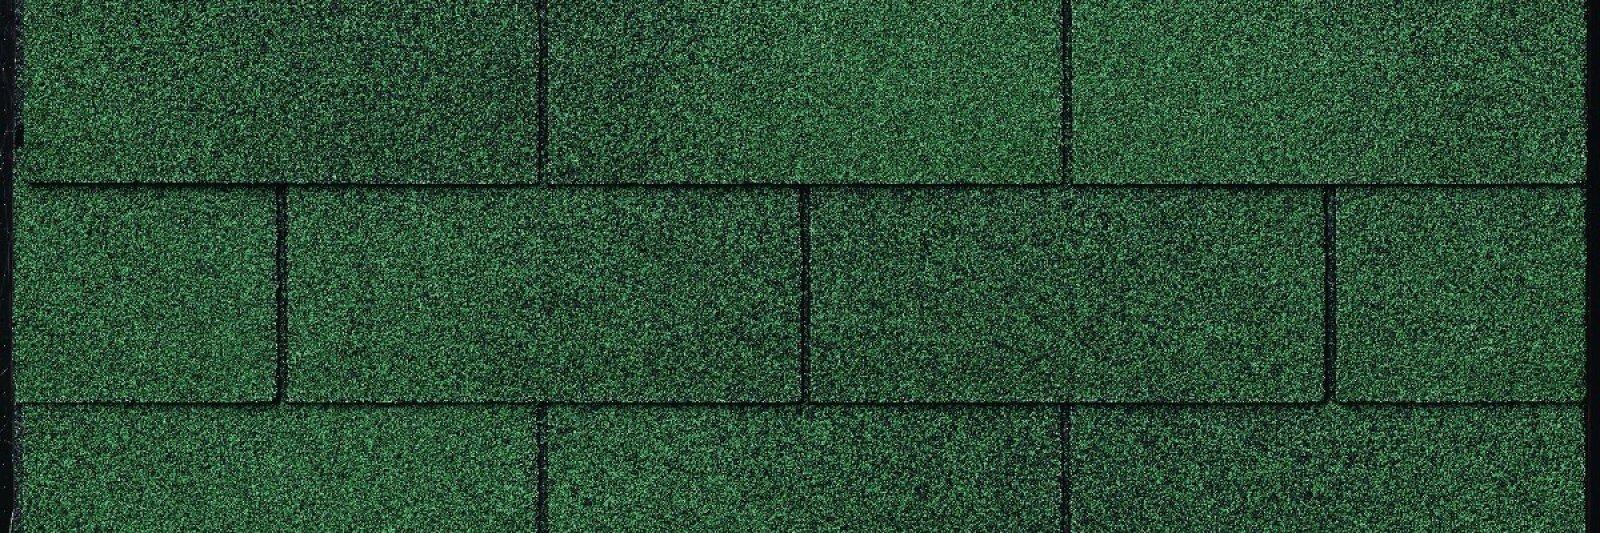 Evergreen Blend image